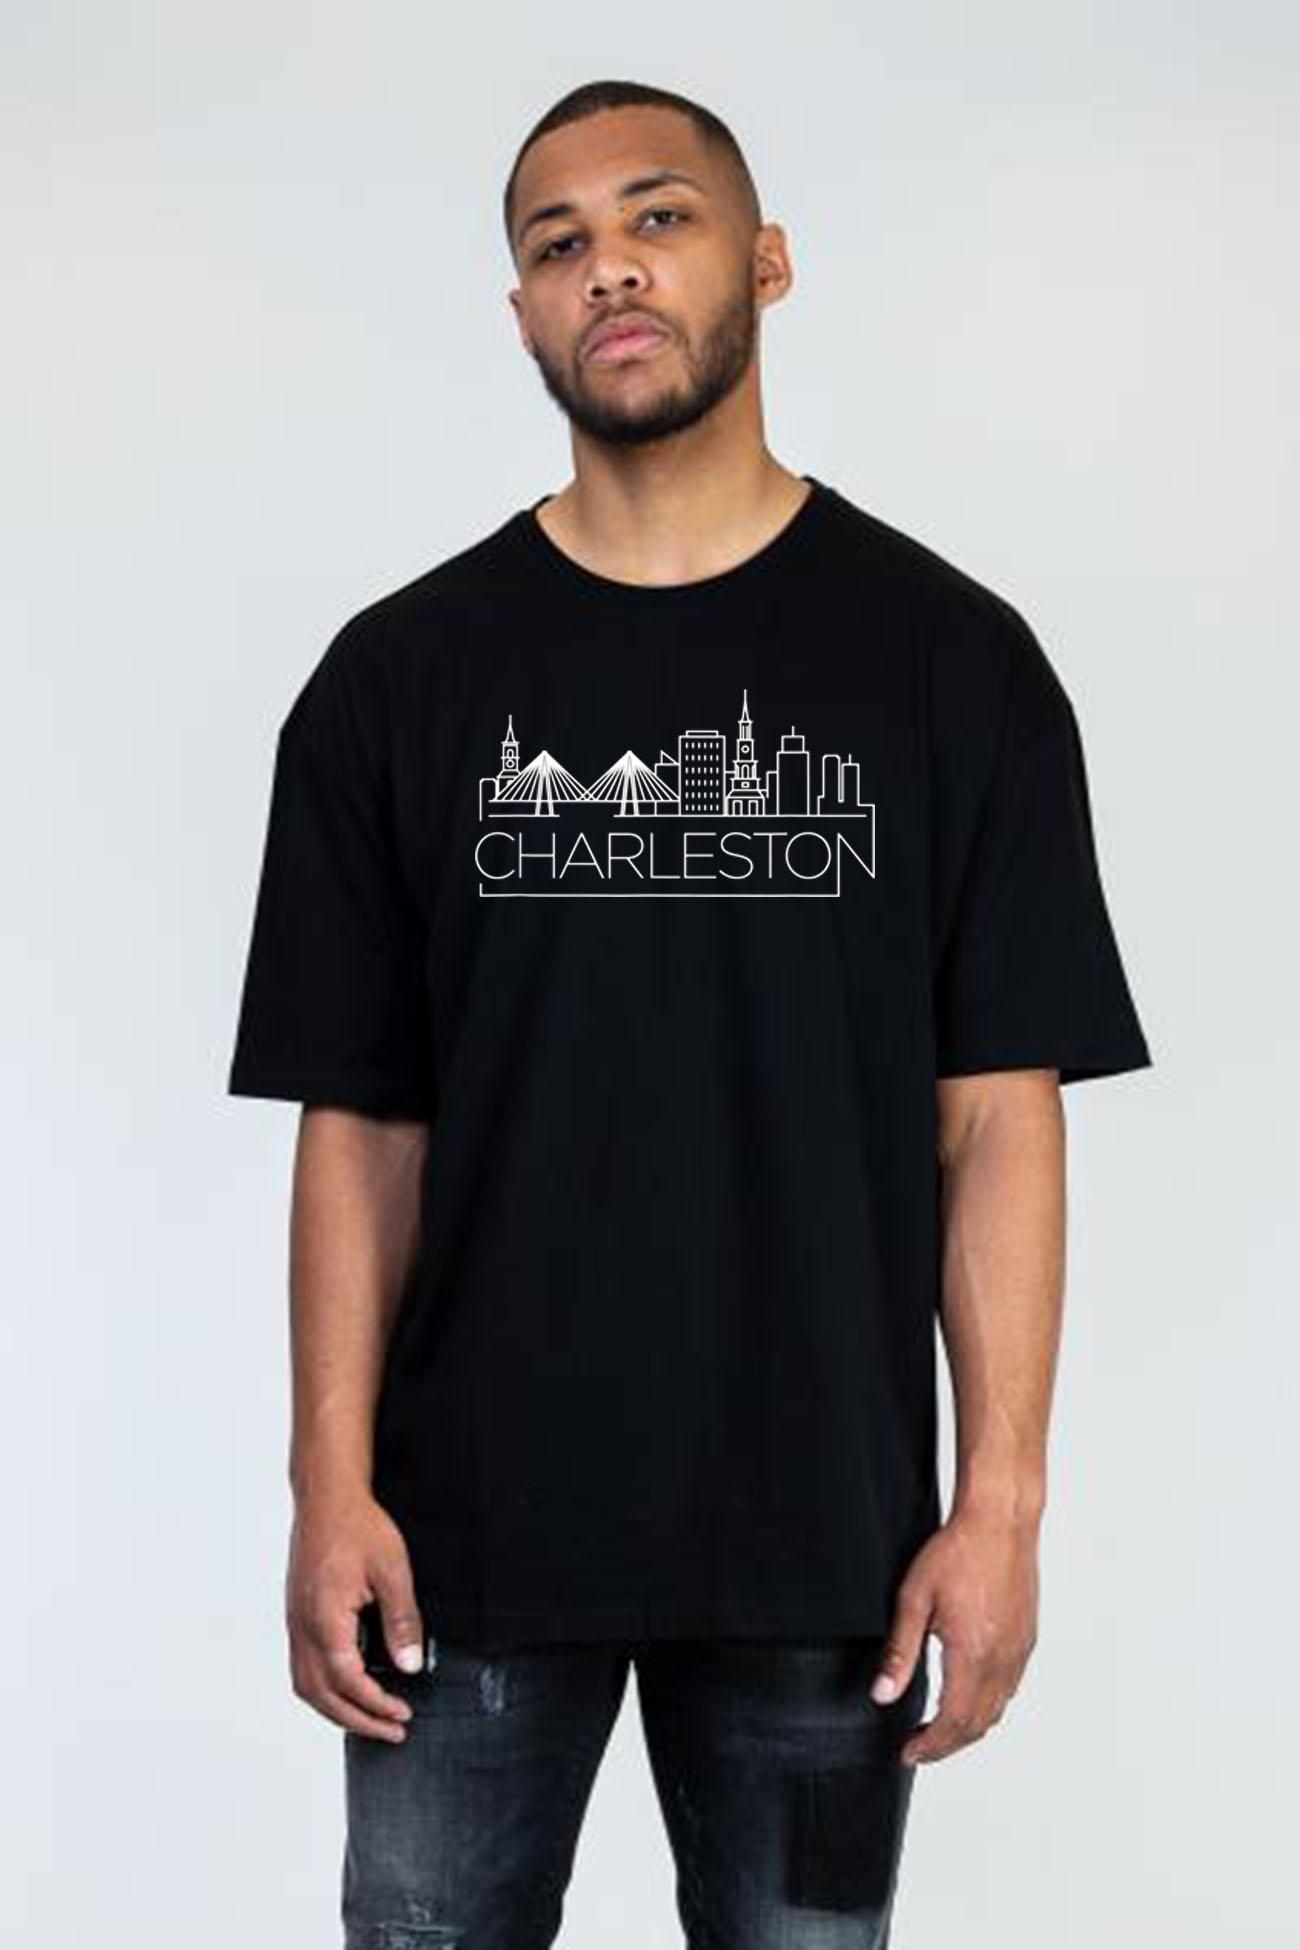 Charleston, South Carolina City Skyline and Classic T-Shirt